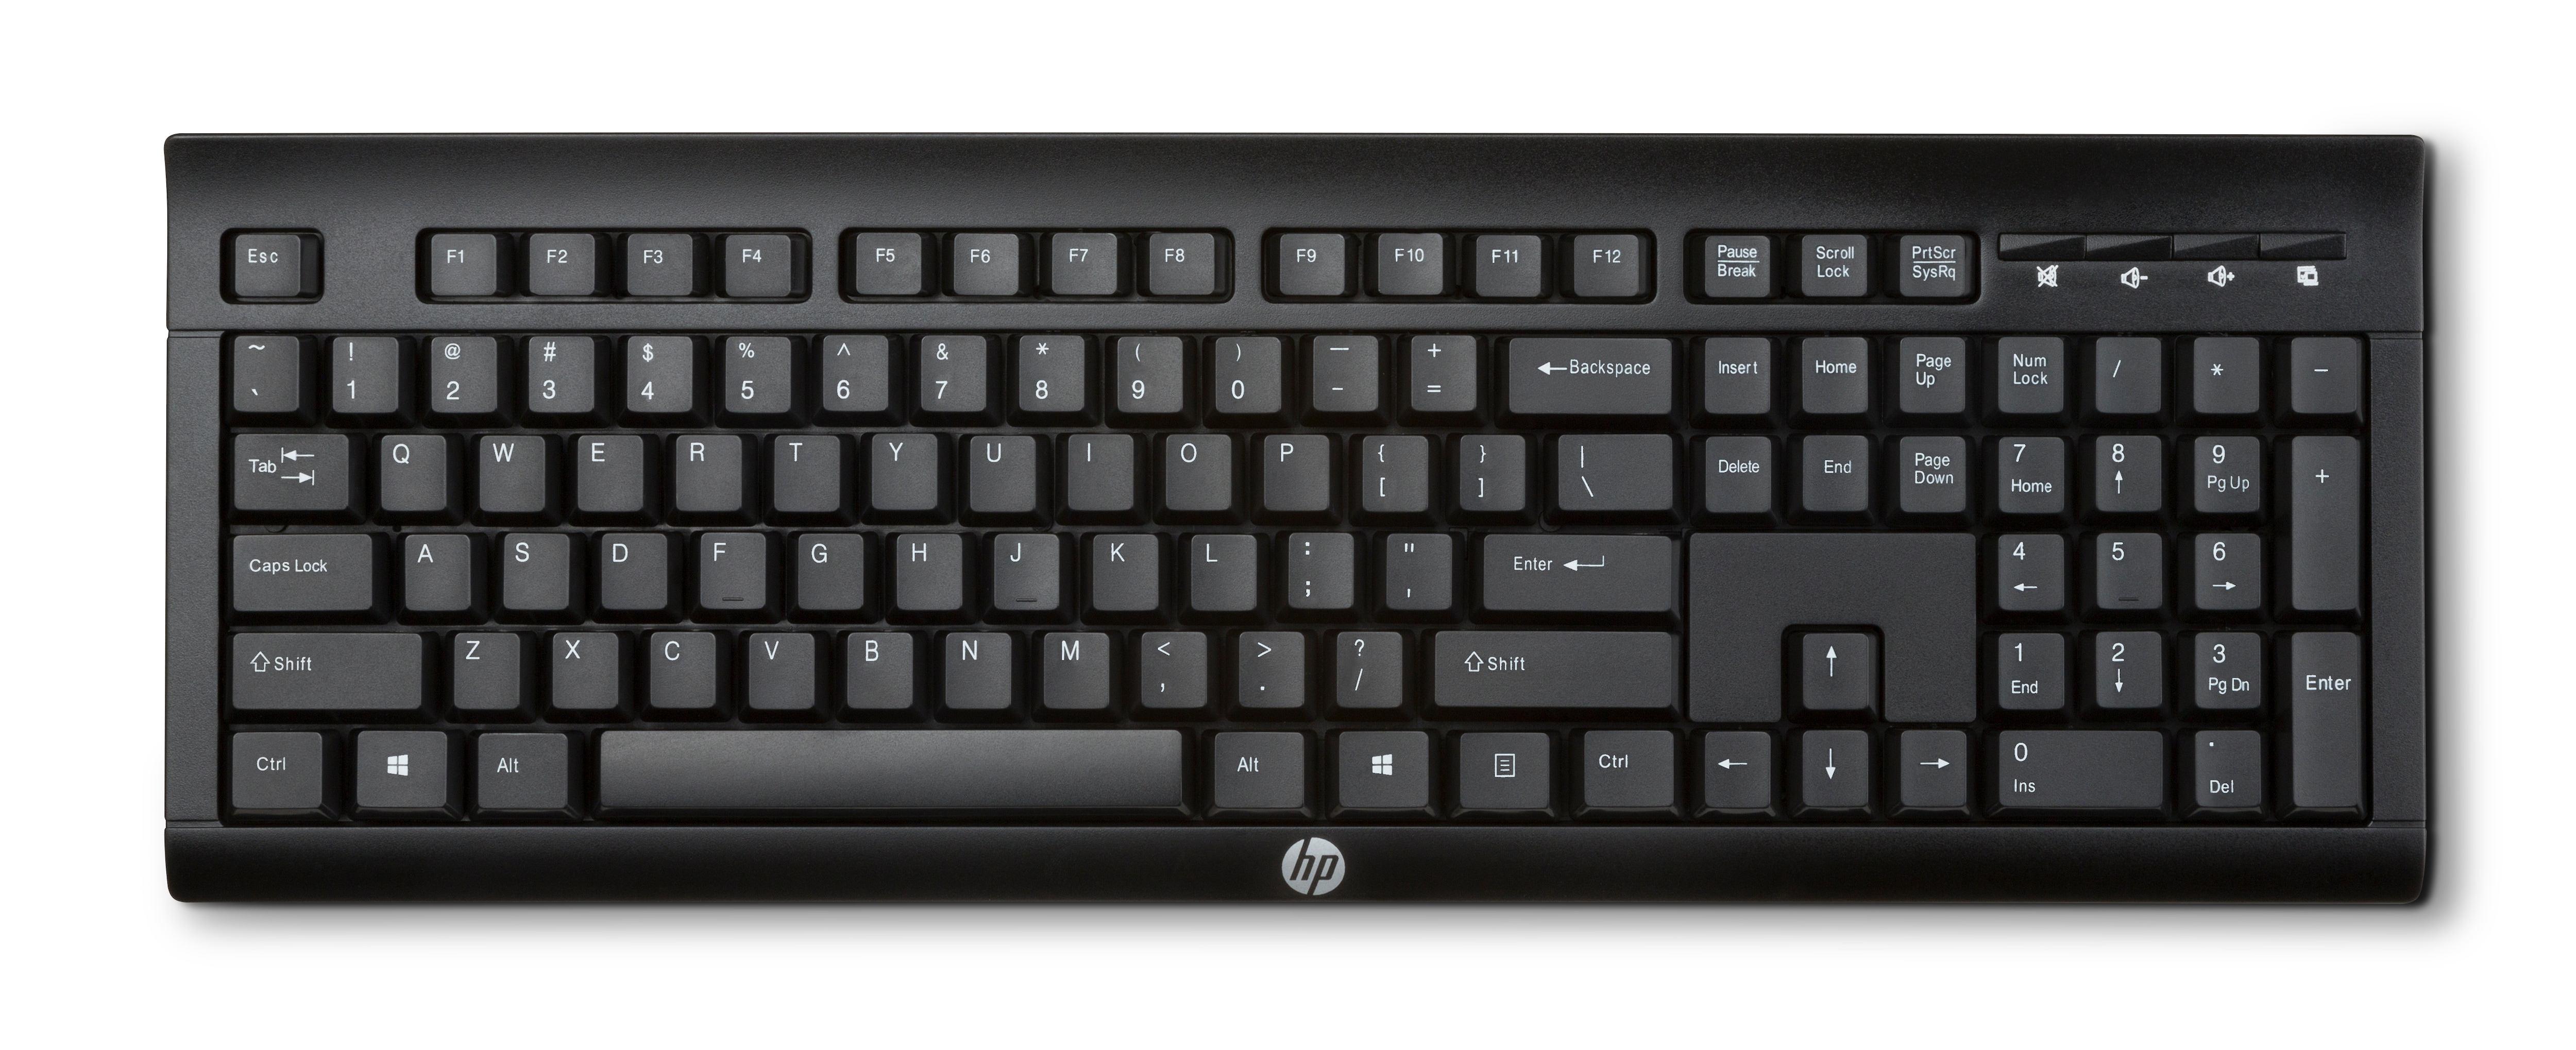 2022274-HP-K2500-tastiera-RF-Wireless-Nero-HP-K2500-Wireless-Tastatur-Versio